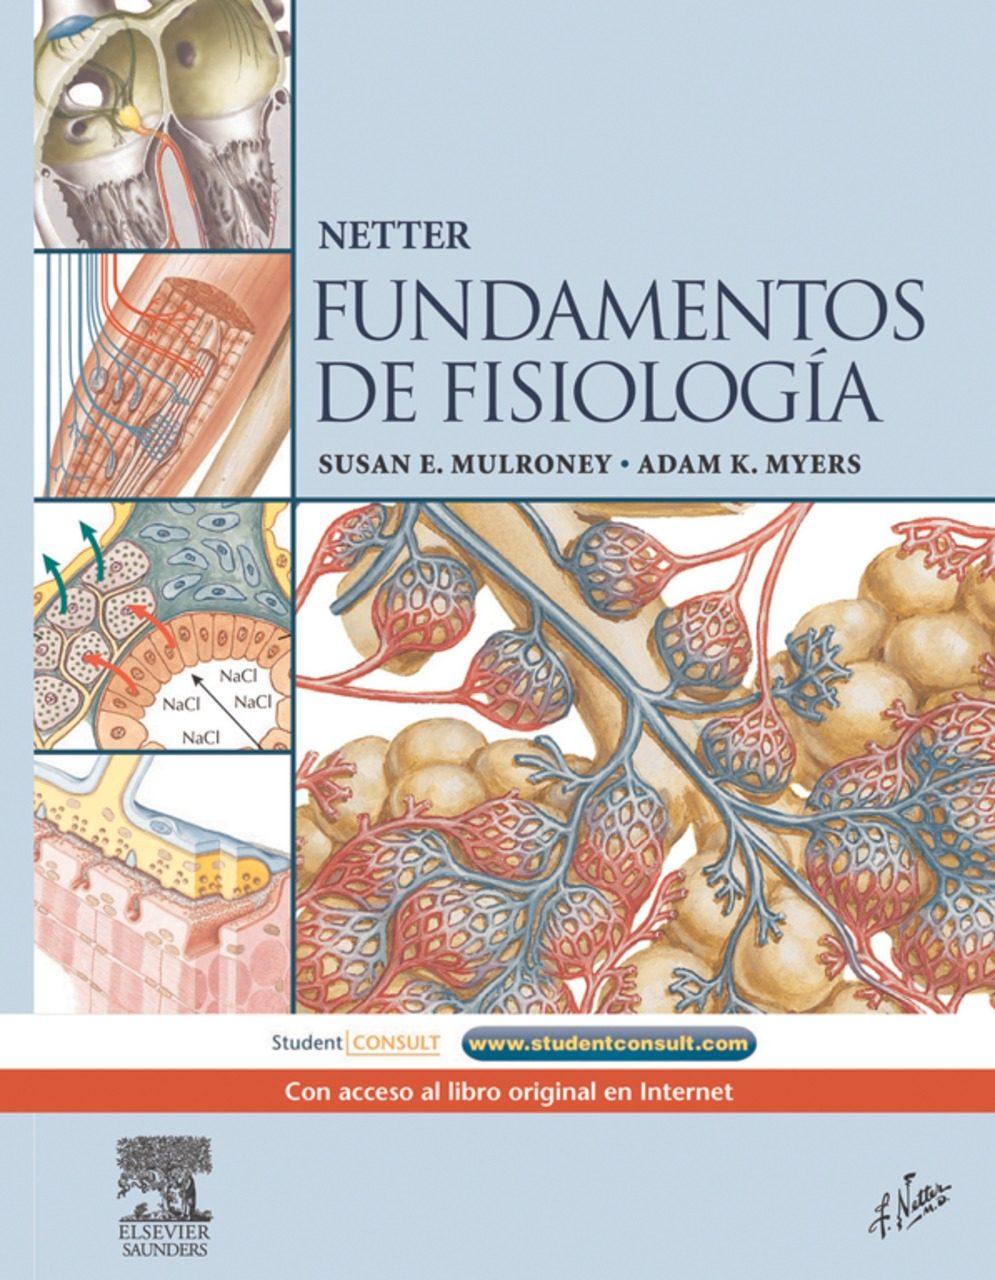 NETTER. FUNDAMENTOS DE FISIOLOGÍA + STUDENTCONSULT EBOOK | VV.AA ...